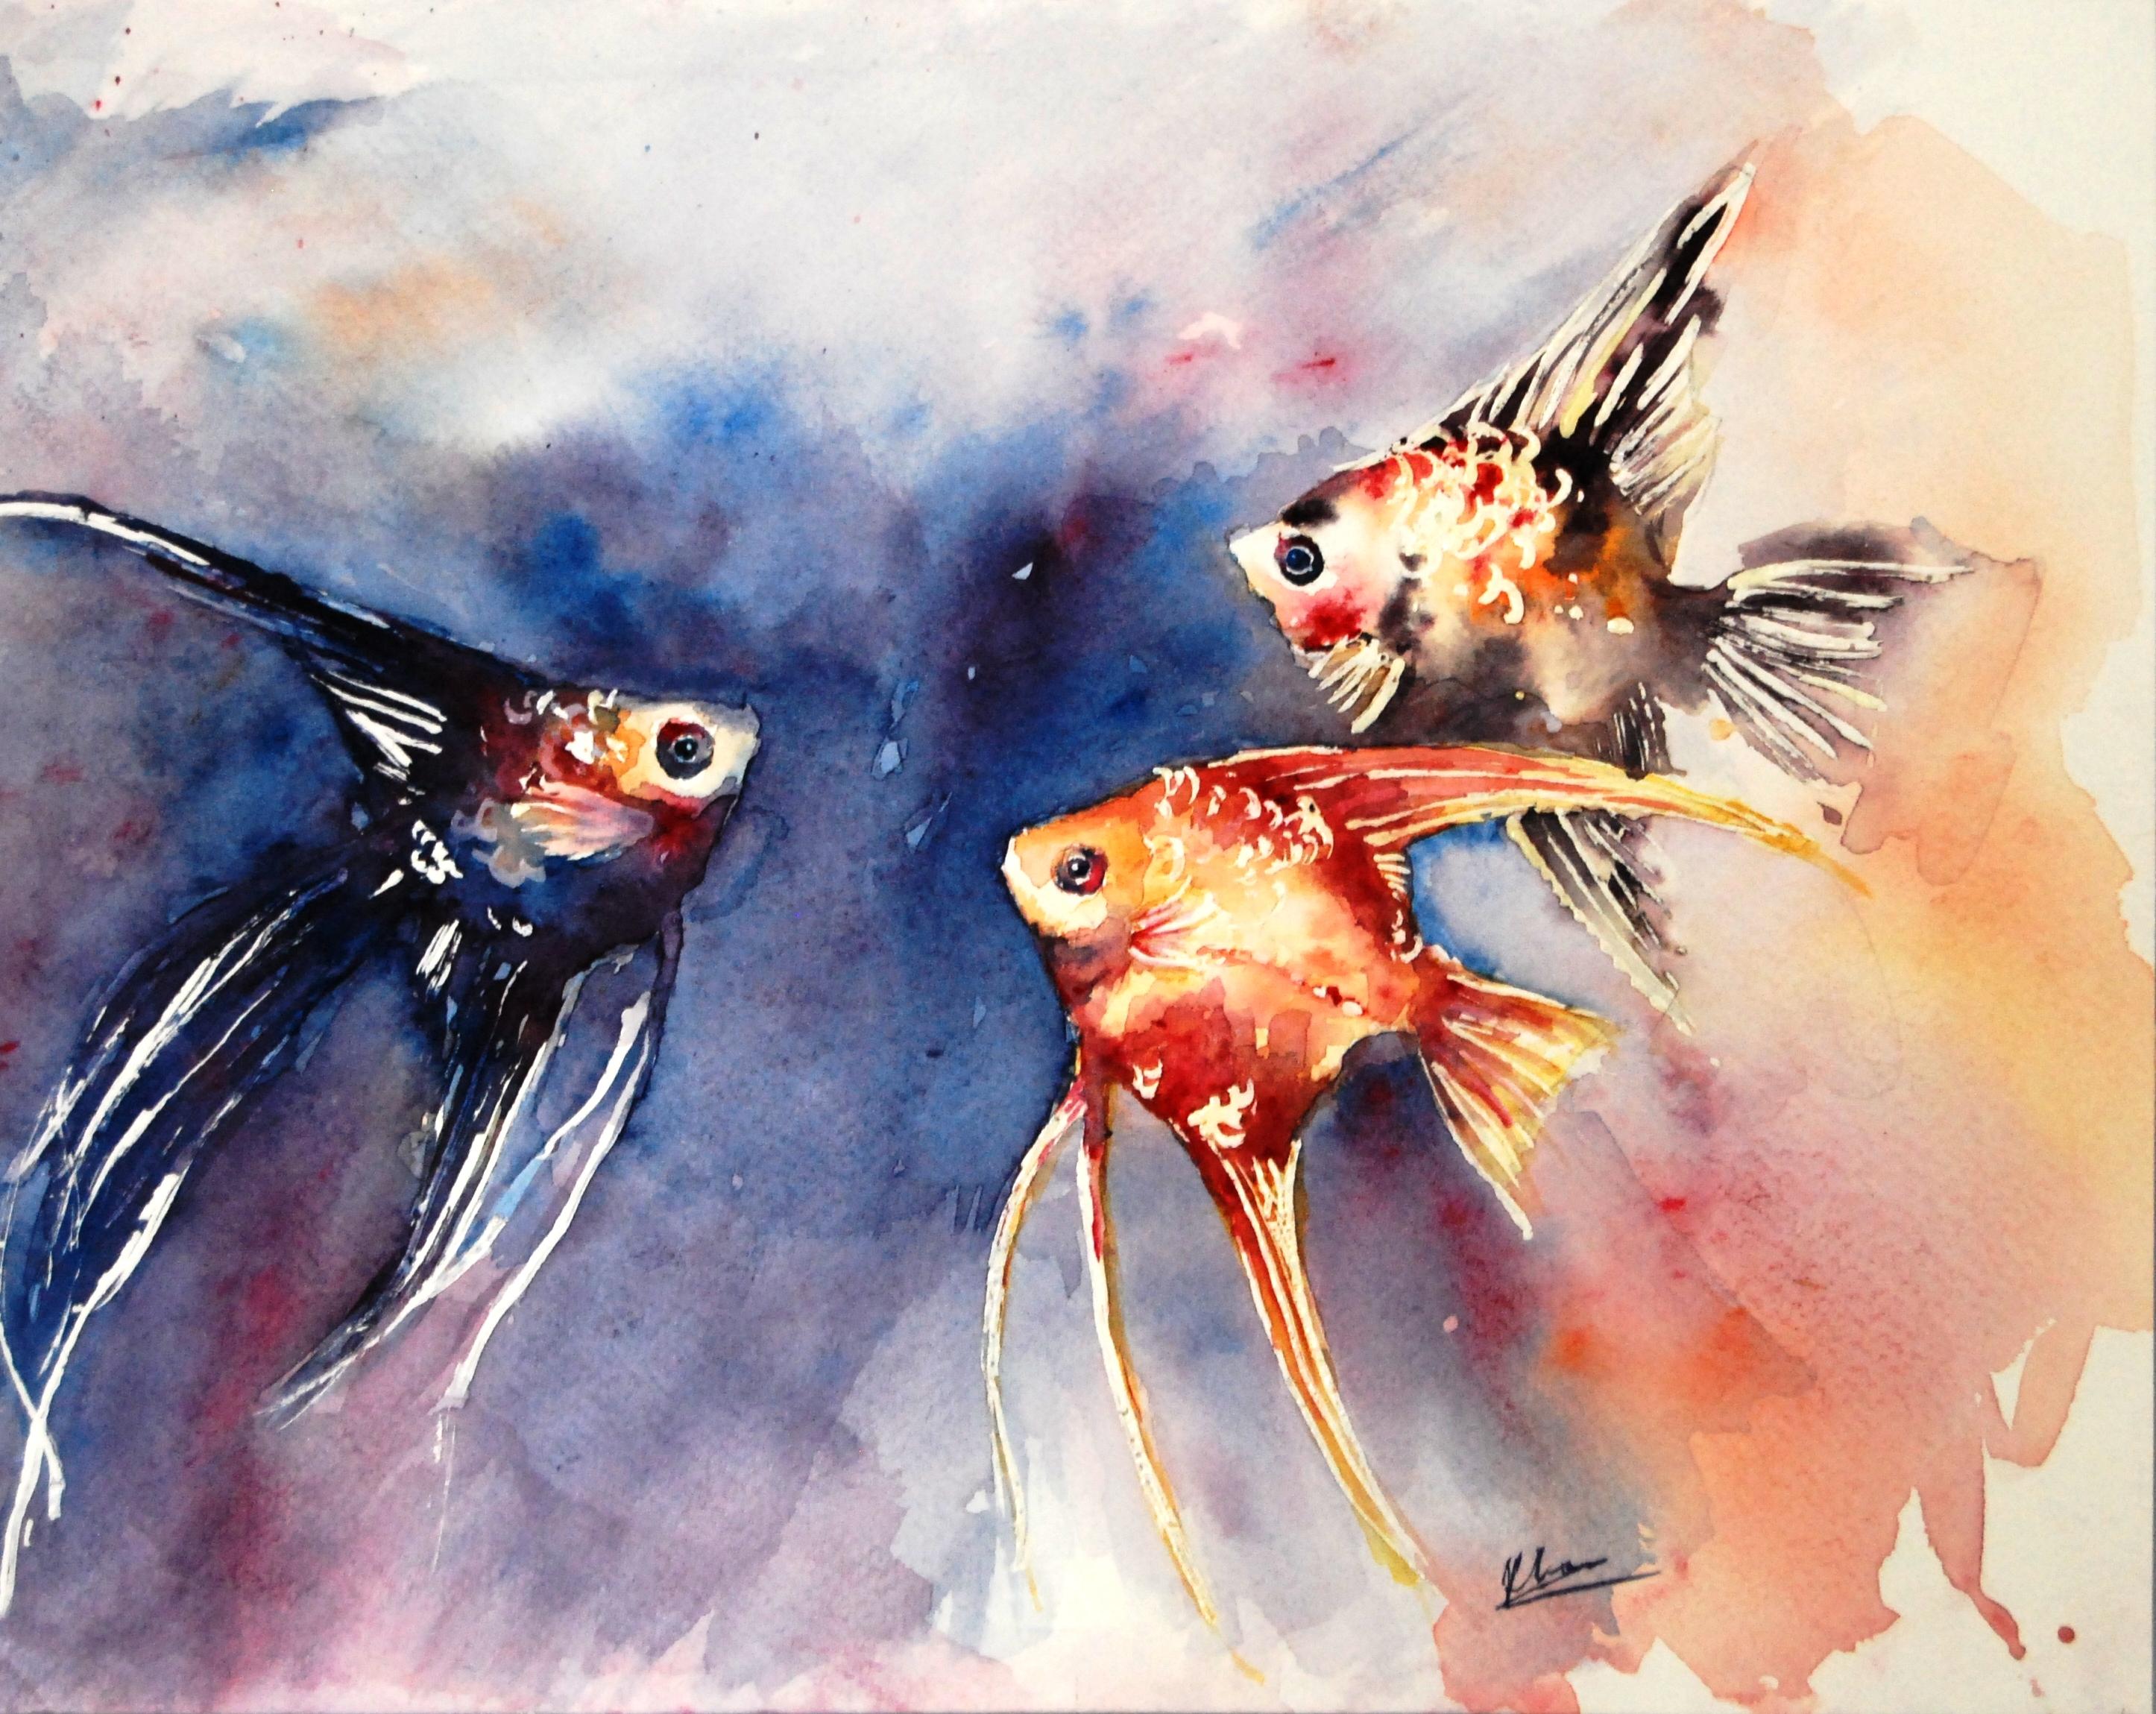 Angel fish by DeepBlueEyesz on DeviantArt